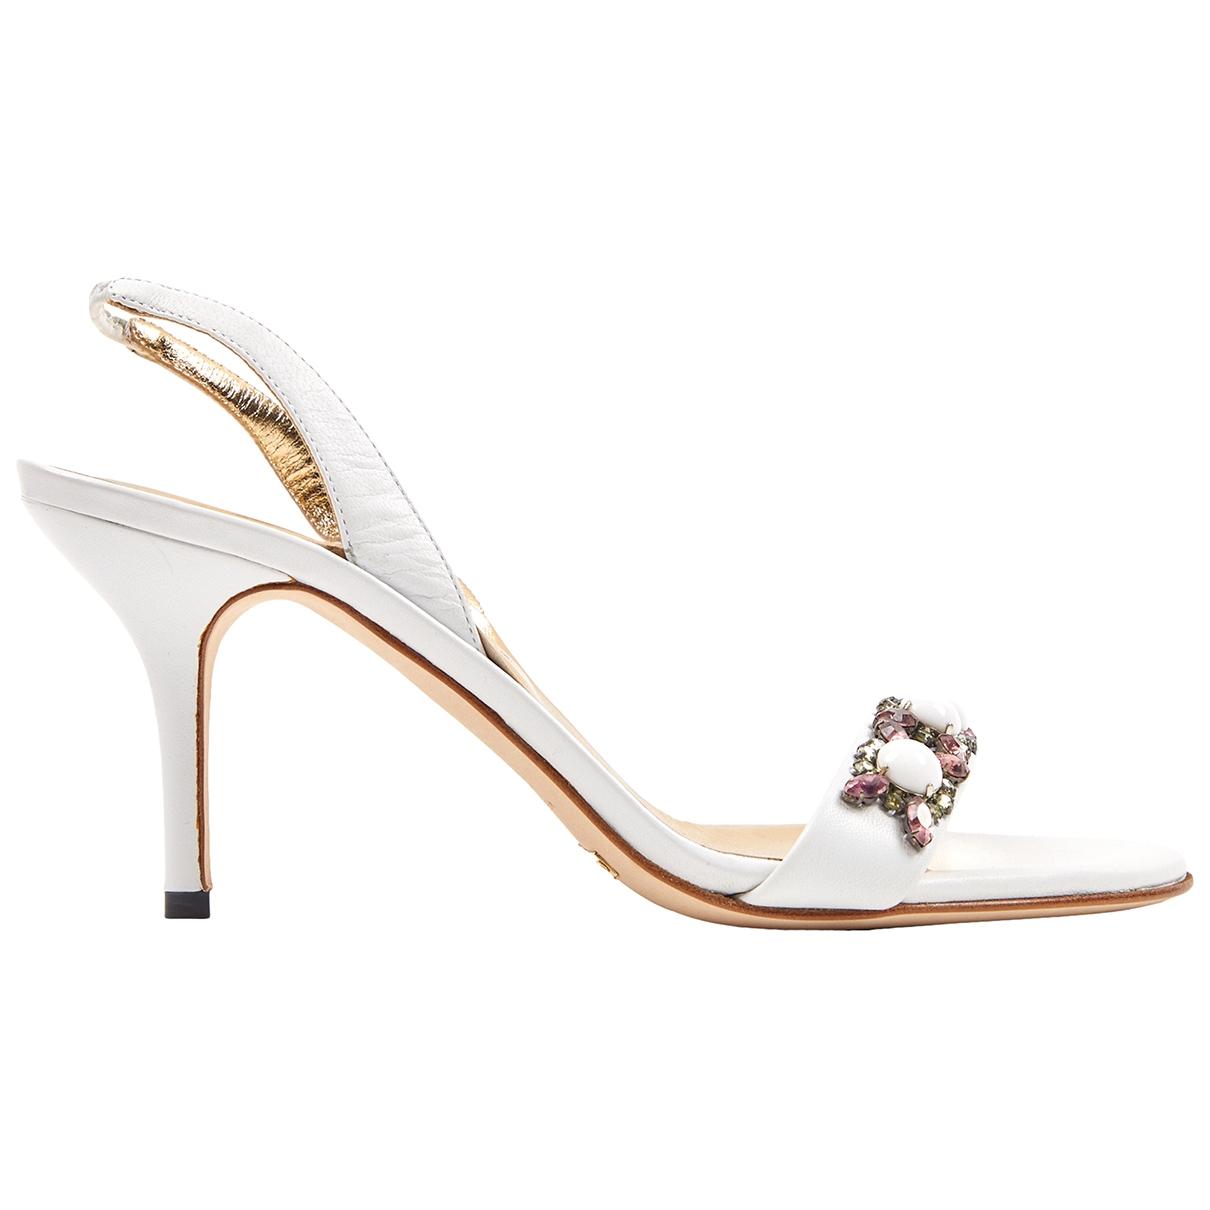 Dolce & Gabbana \N Sandalen in  Weiss Leder